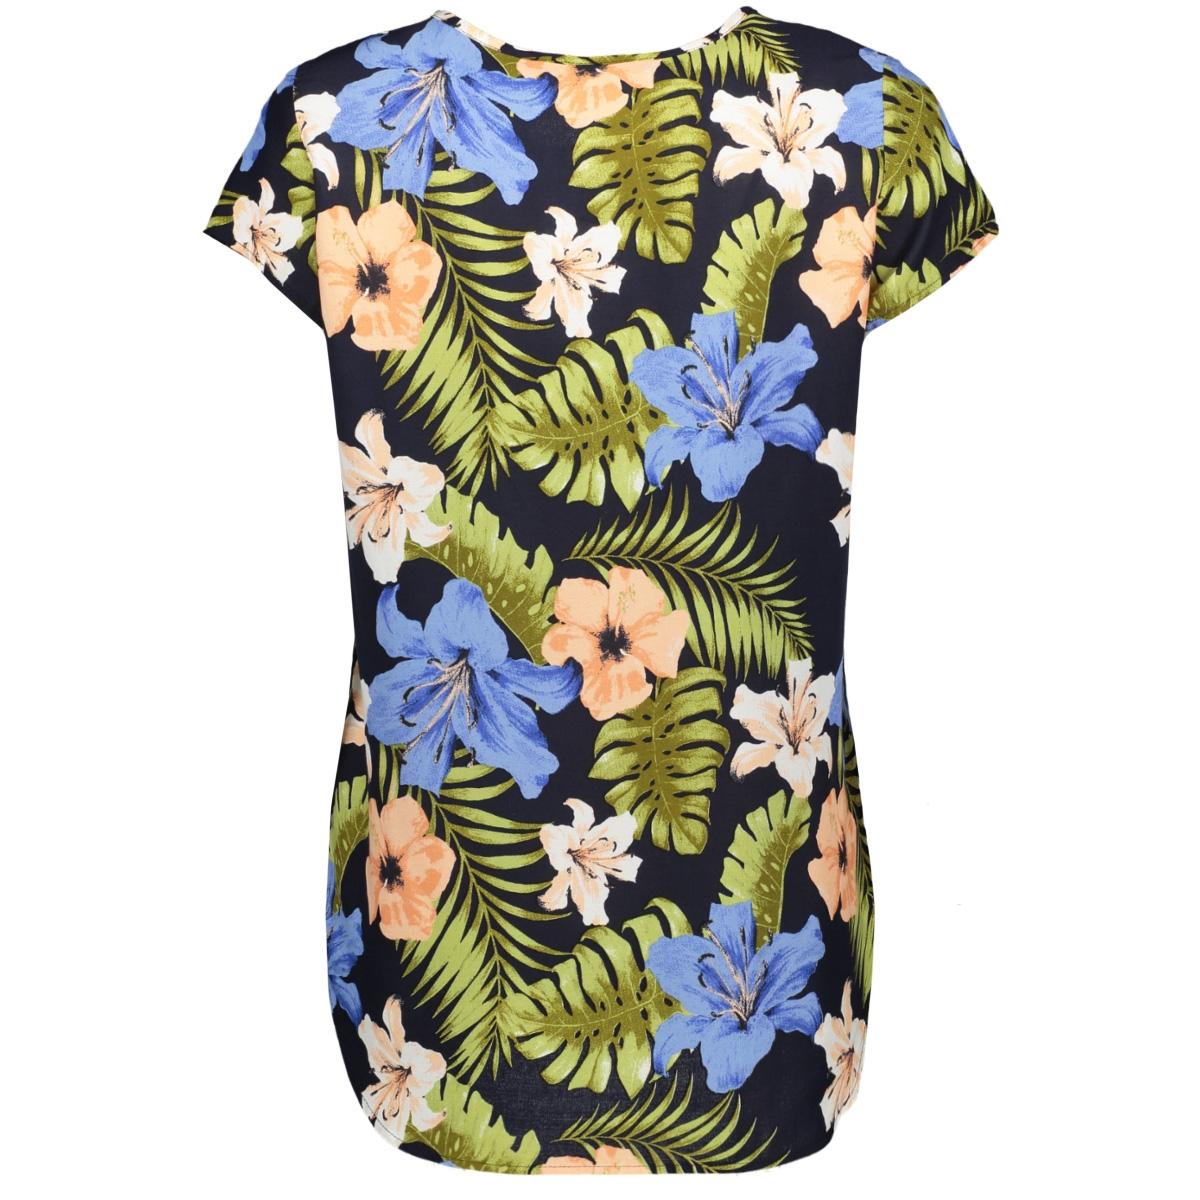 vmboca ss blouse multi aop 10132802 vero moda t-shirt night sky/effie aop